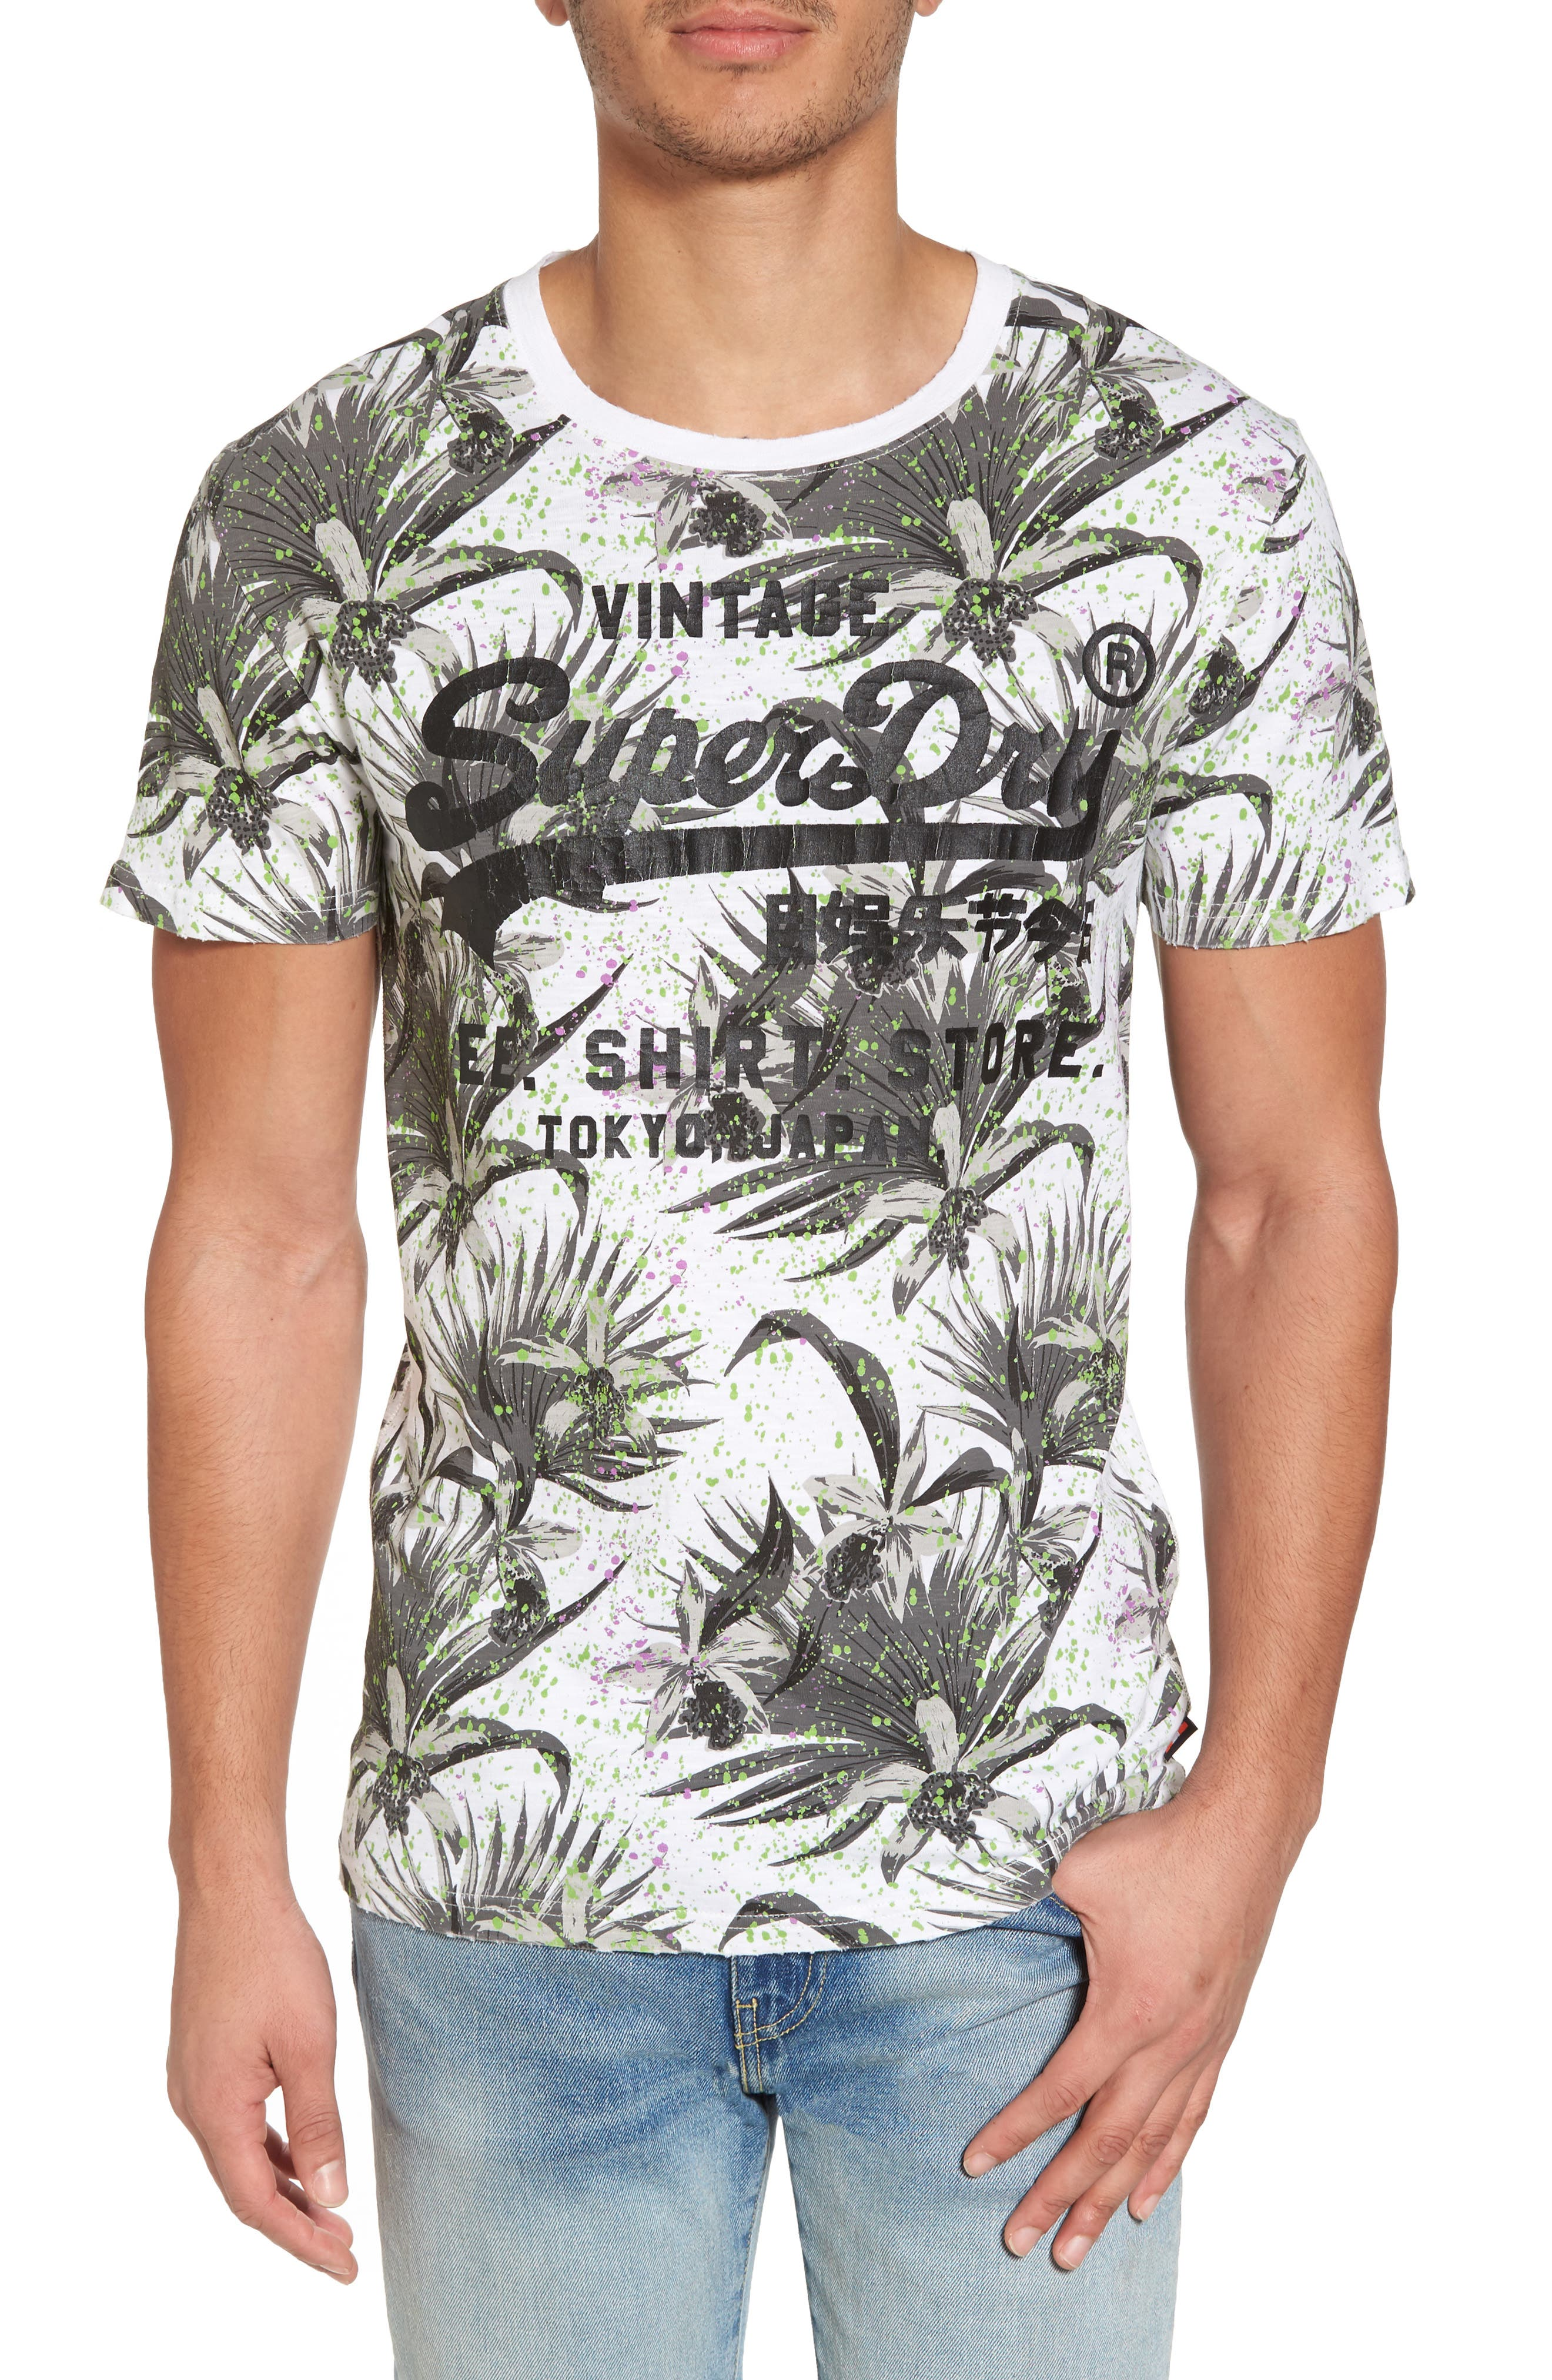 Shirt Shop Aop T-Shirt,                         Main,                         color, OPTIC